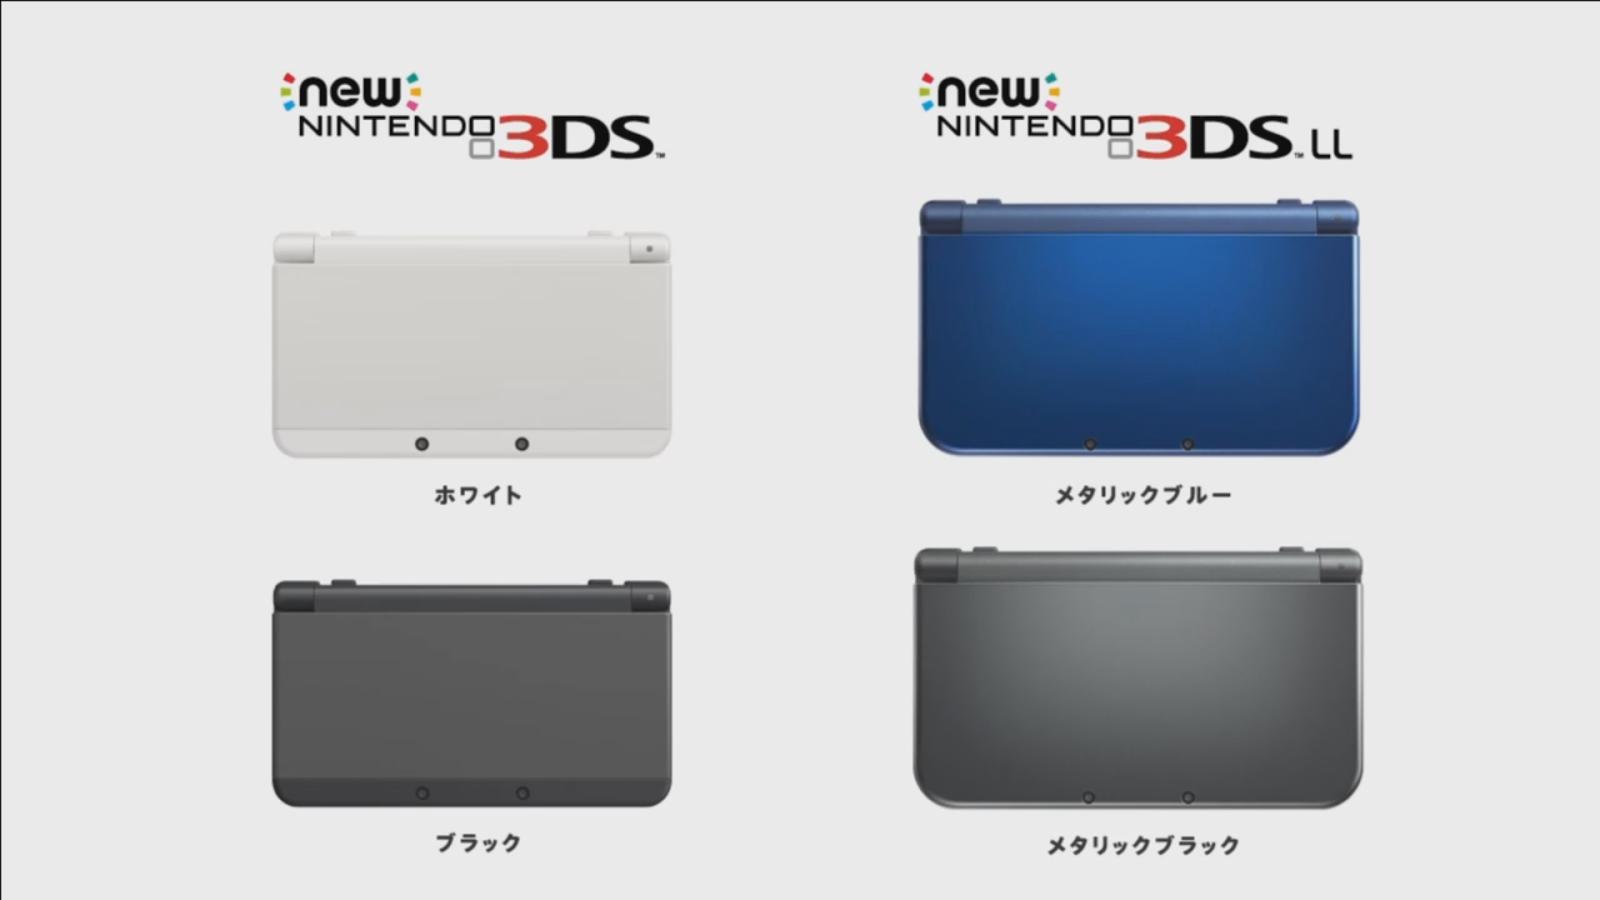 [GAMES] New Nintendo 3DS - Trava de região confirmada! Kyzhqn4tqlwqsarybdqk